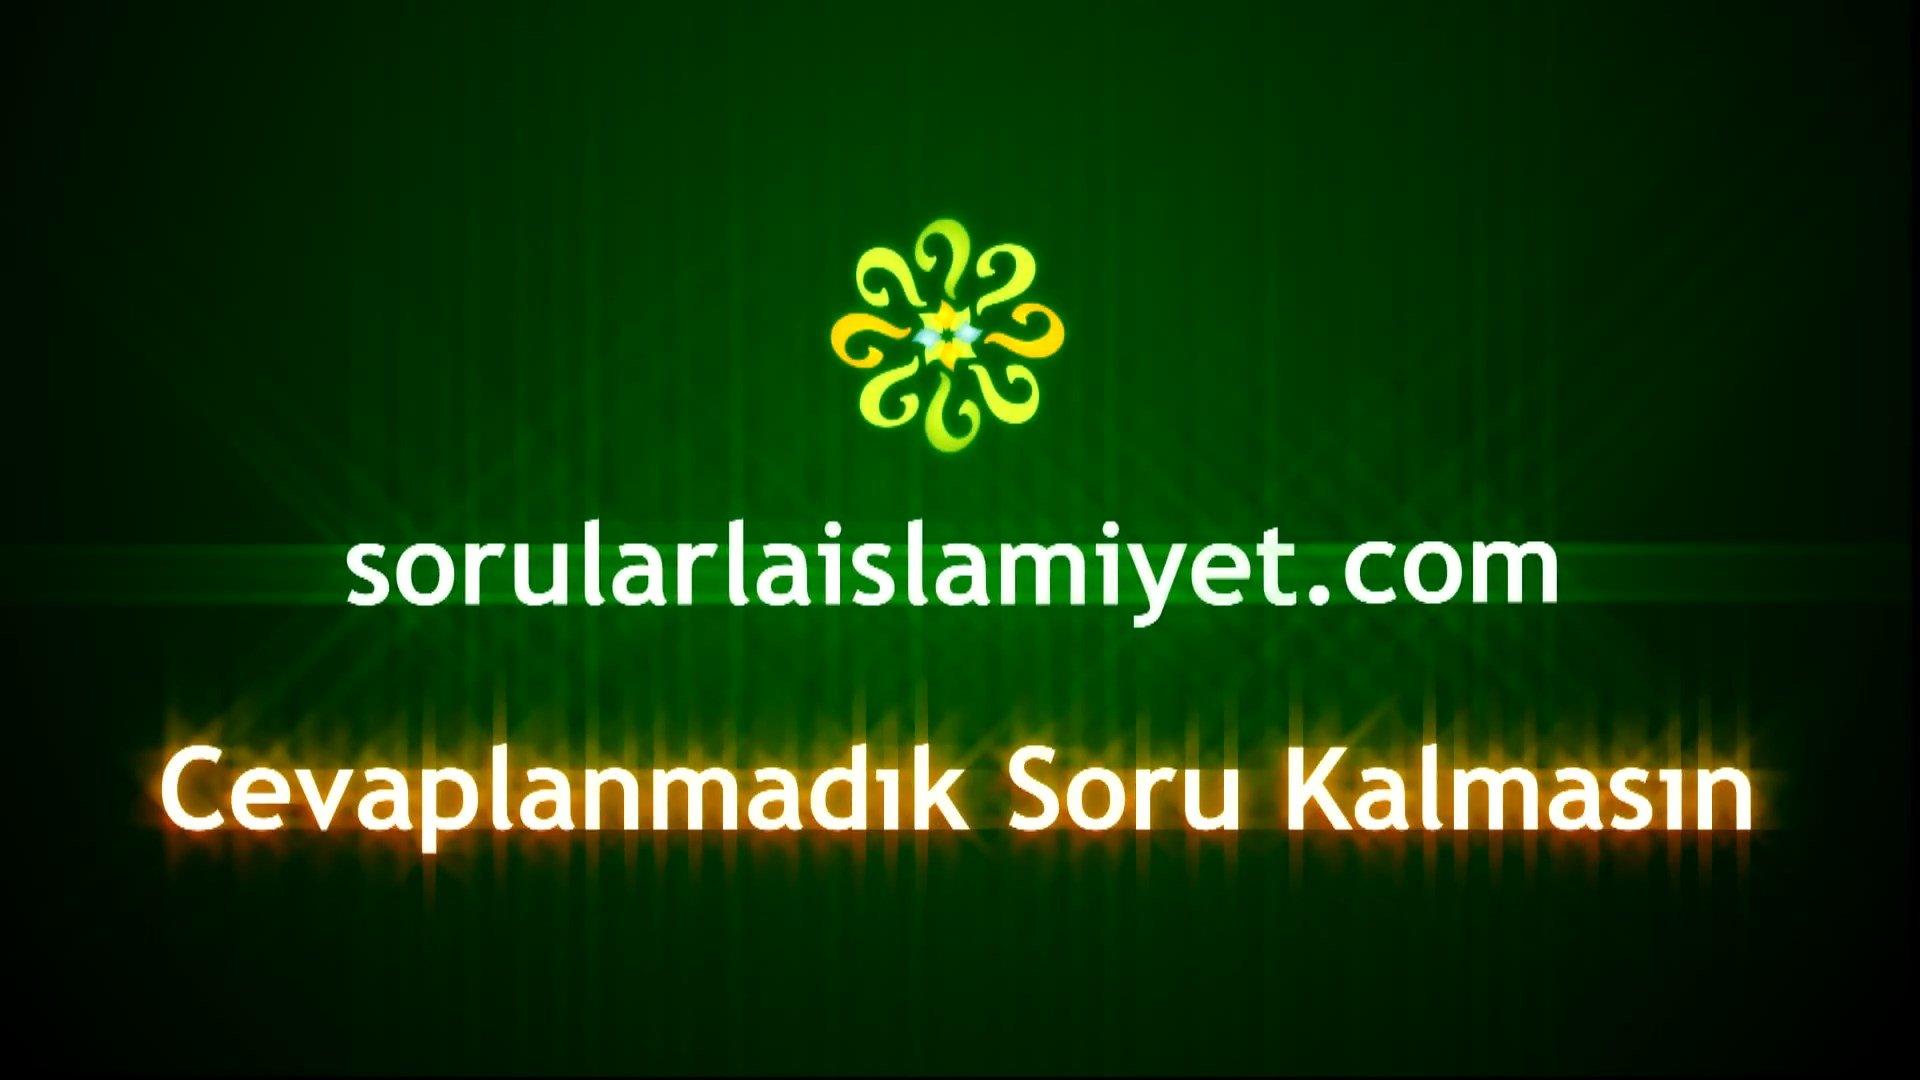 Sorularlaislamiyet.com Reklam Filmi 7 1920x1080 - Sorularlaislamiyet.com Reklam Filmi